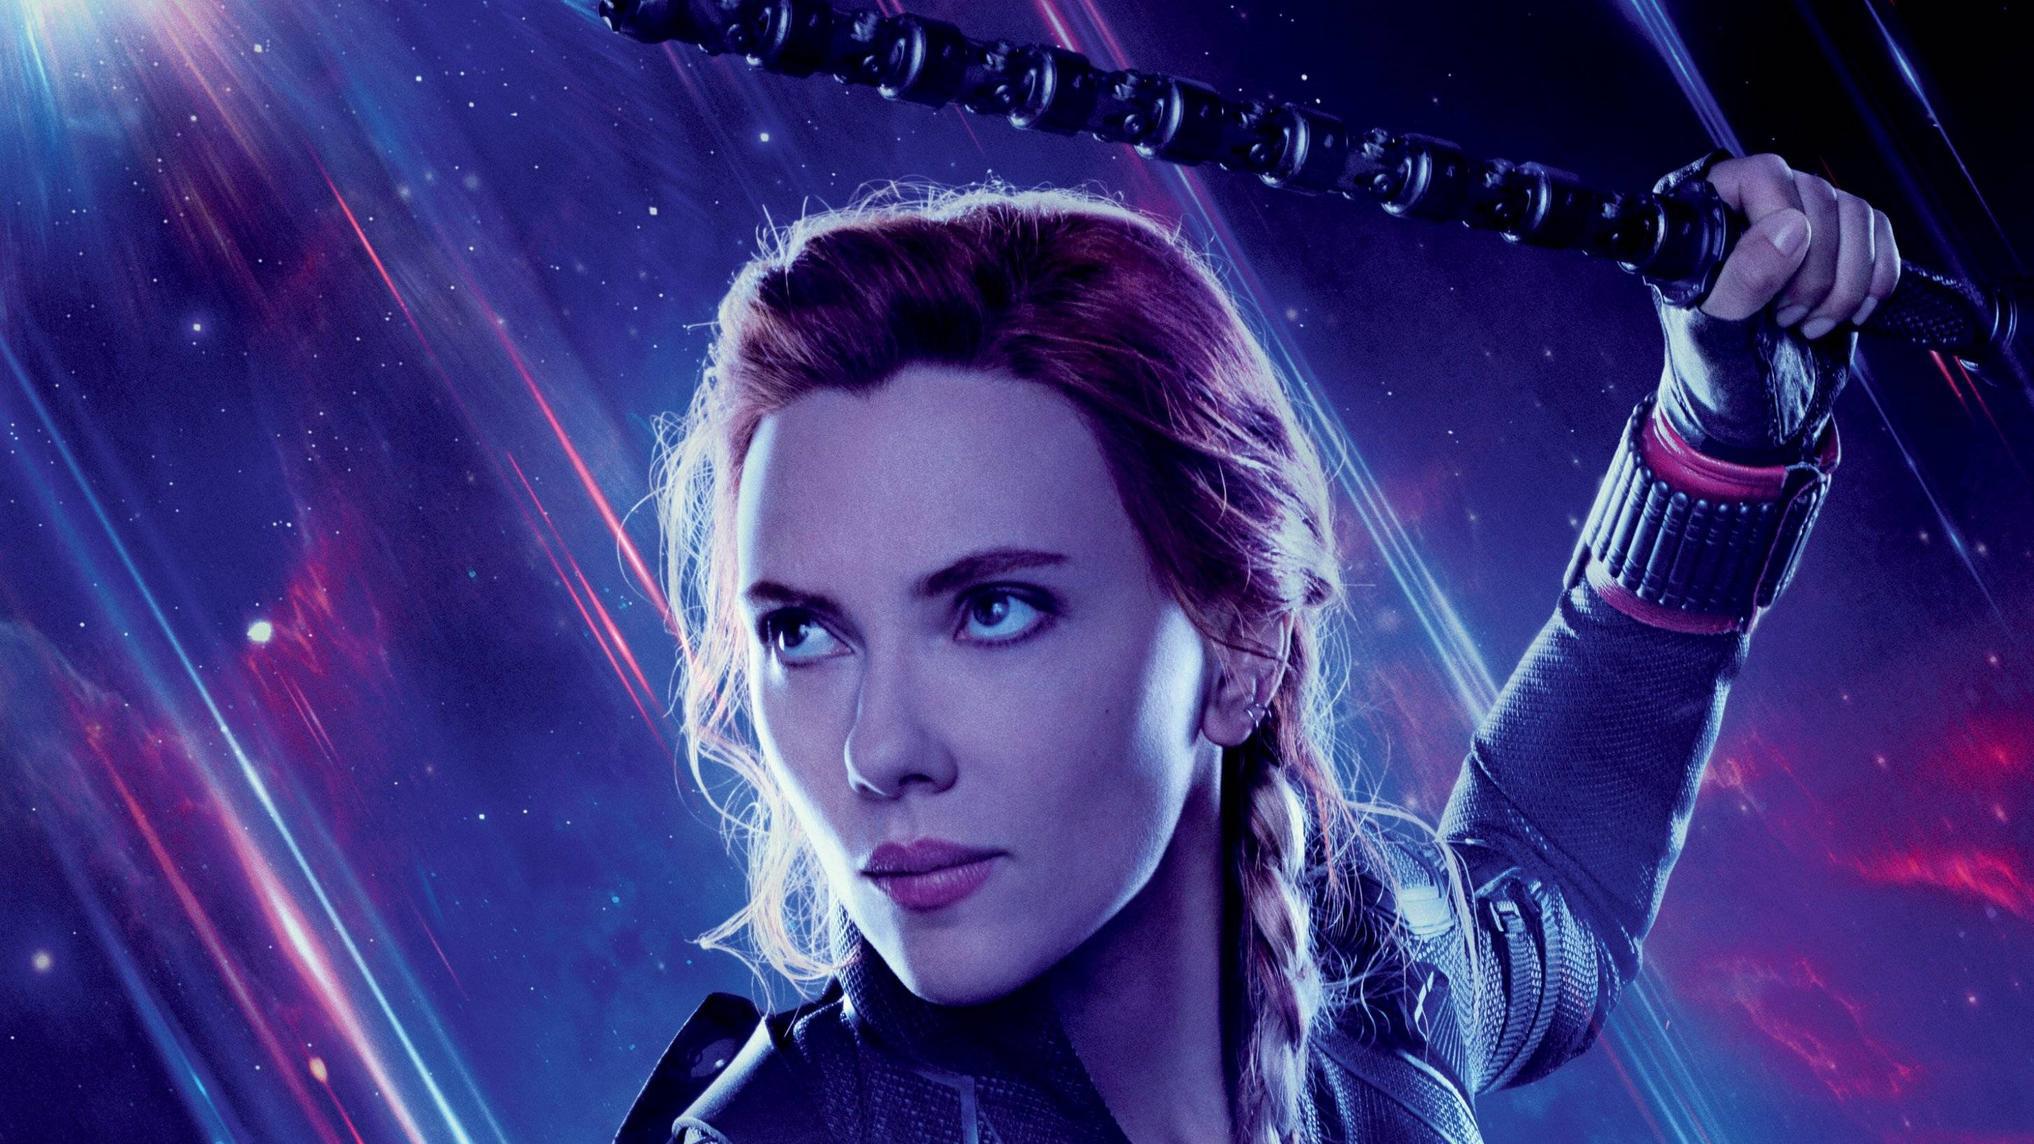 Black Widow In Avengers Endgame Hd Movies 4k Wallpapers